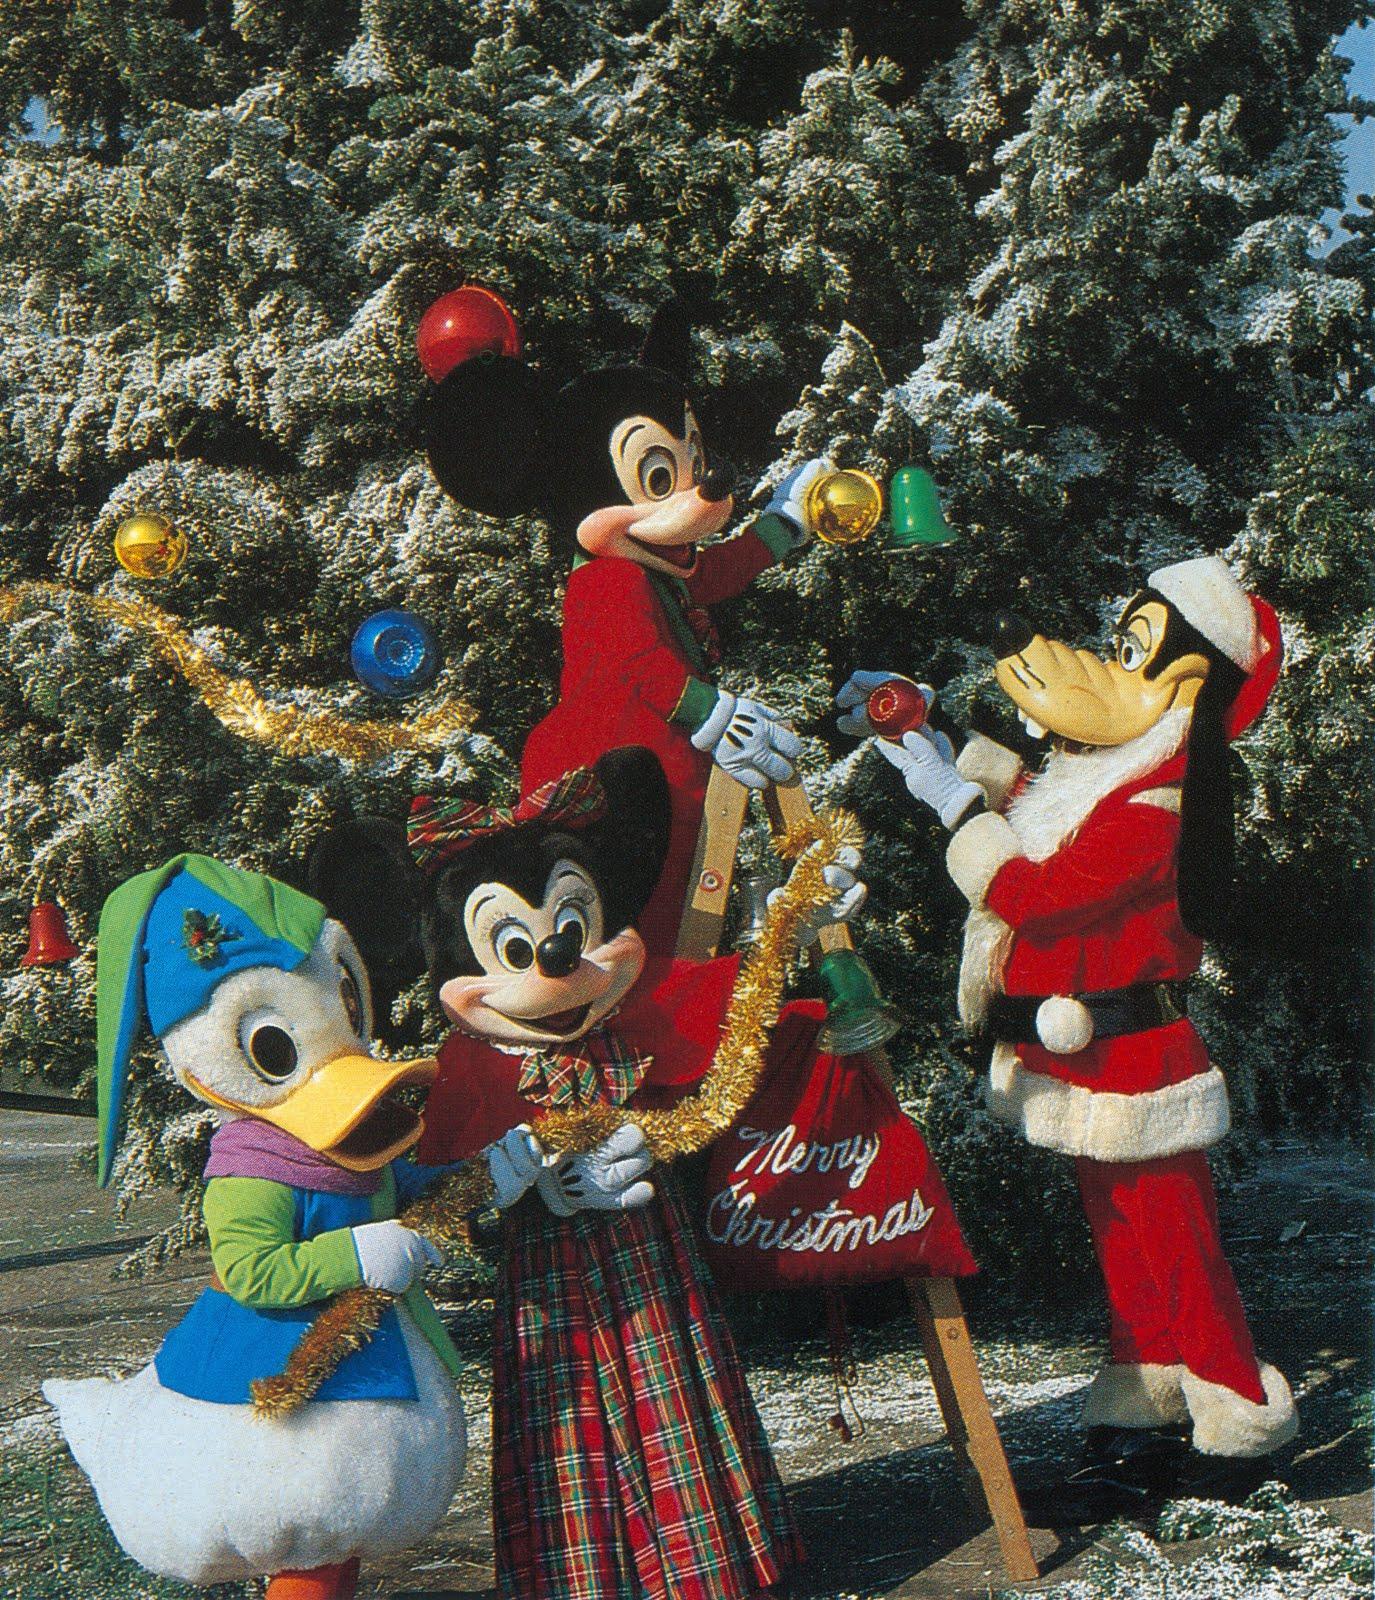 Disneyland Decorated For Christmas: Disney On Parole: Disneylands LIVE Christmas Trees